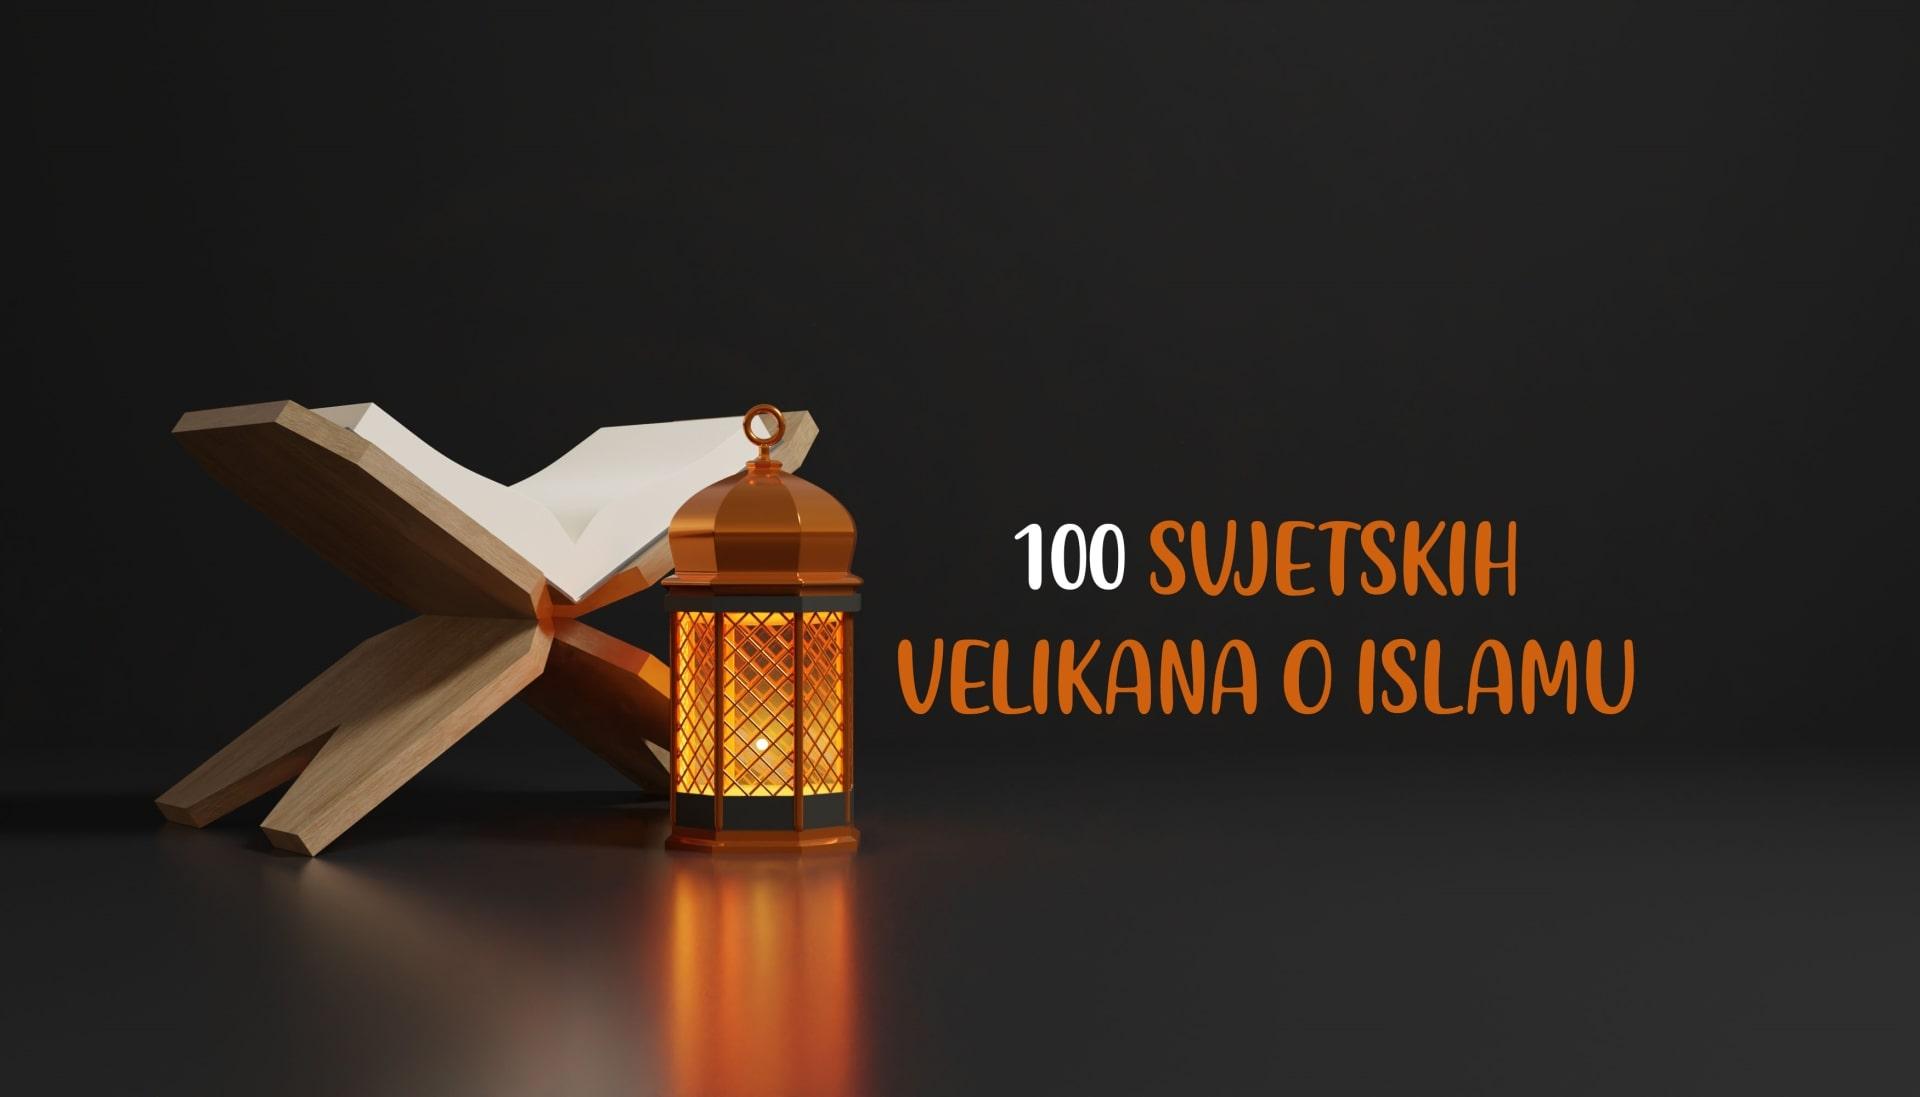 100 svjetskih velikana o islamu – E. Denison Ros Poučne priče El-Kelimeh Islamska literatura Islamske knjige